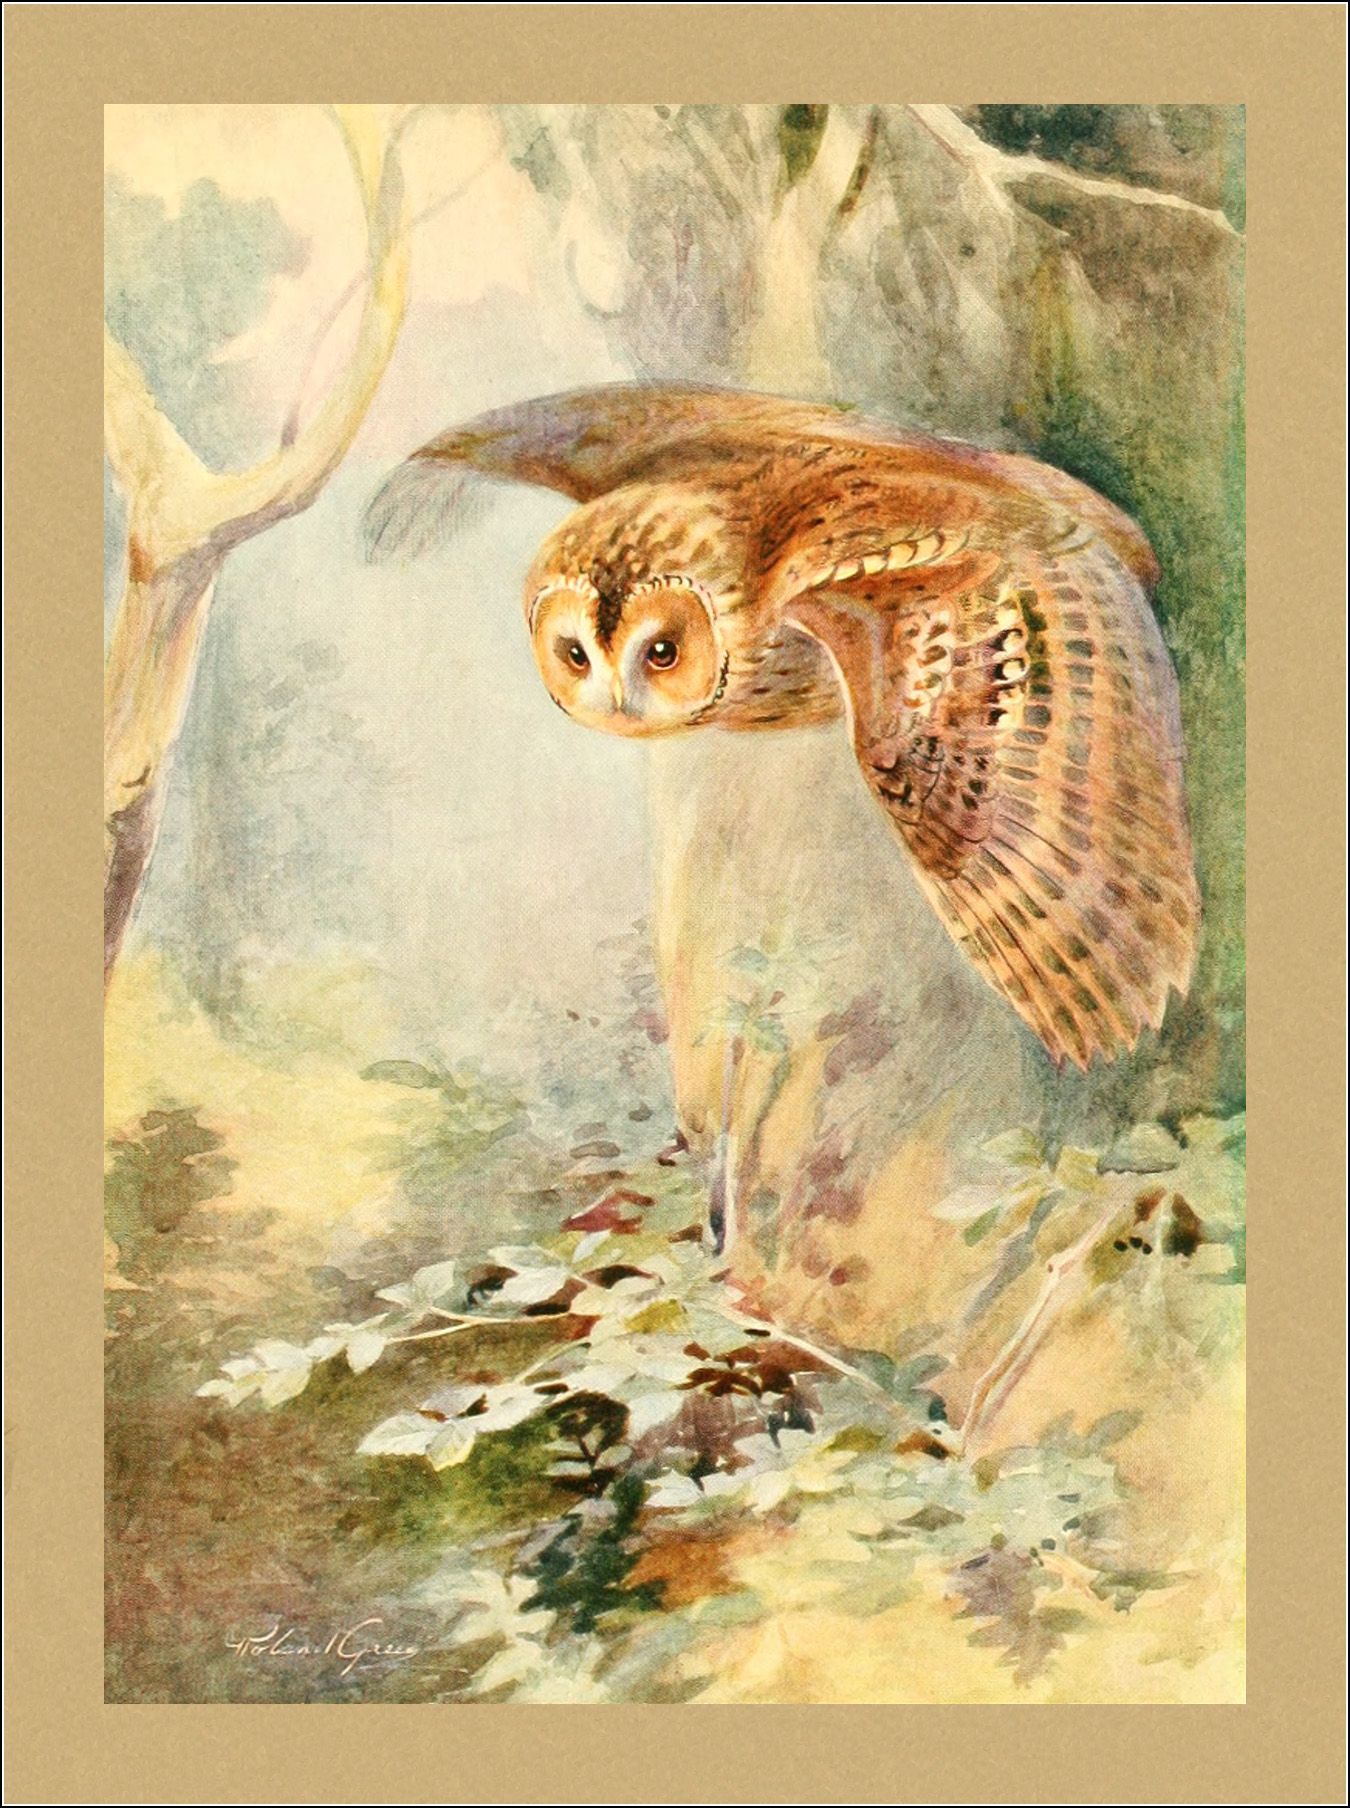 Roland Green, F.Z.S., Birds in flight